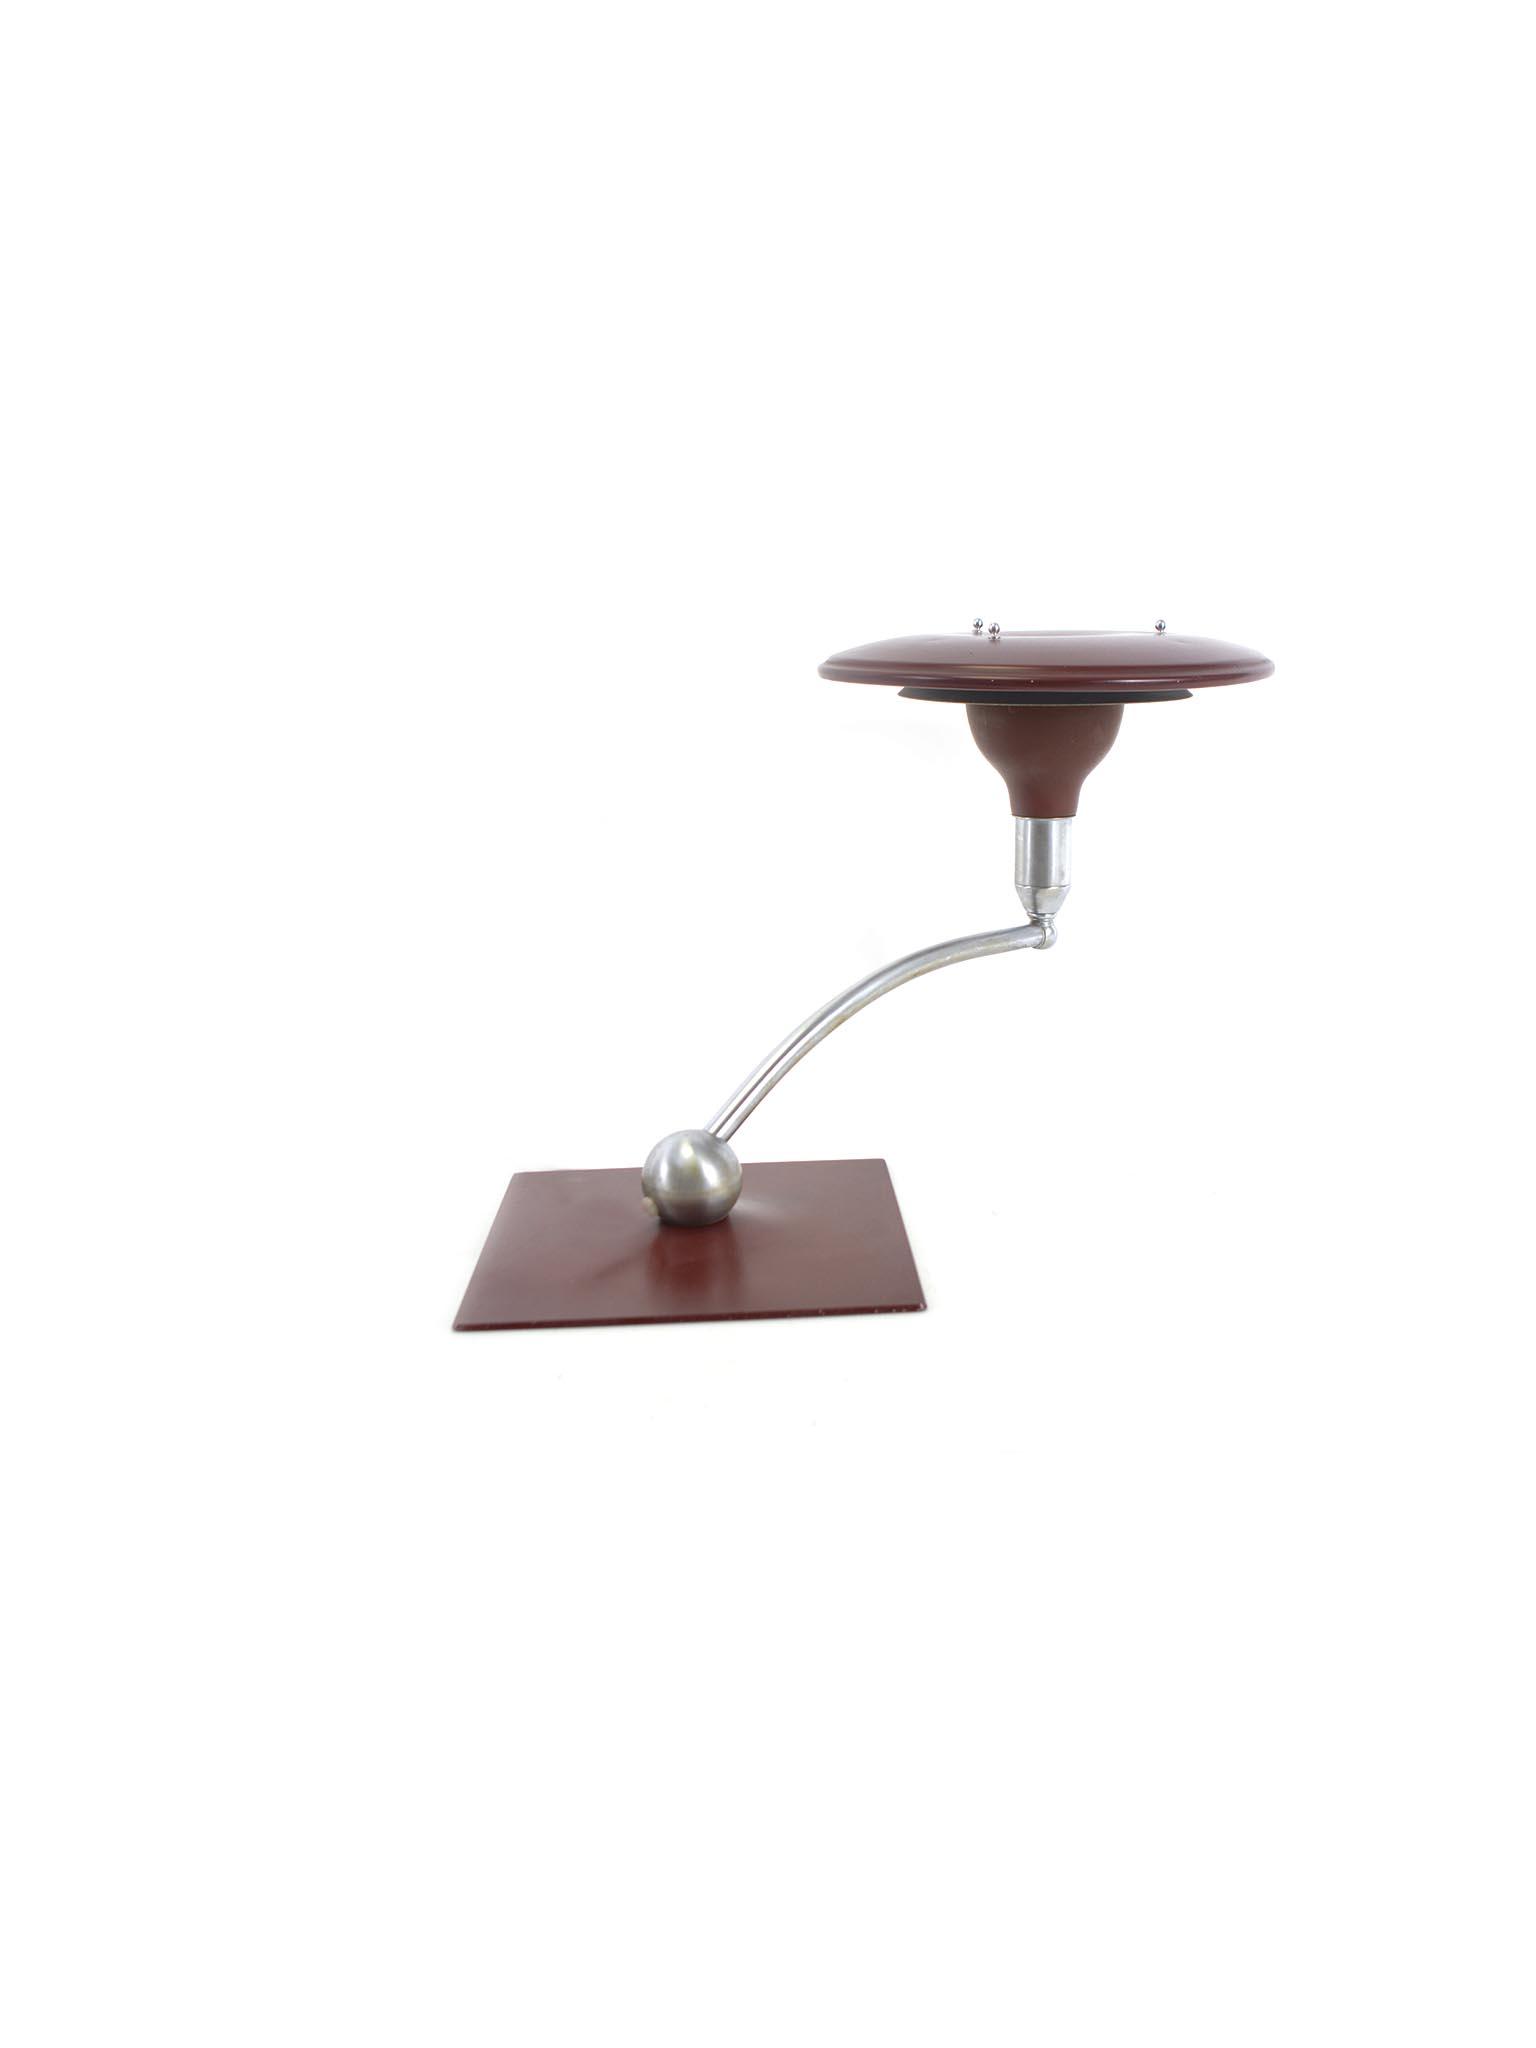 SIGHTLIGHT DESK LAMP BY M. G. WHEELER